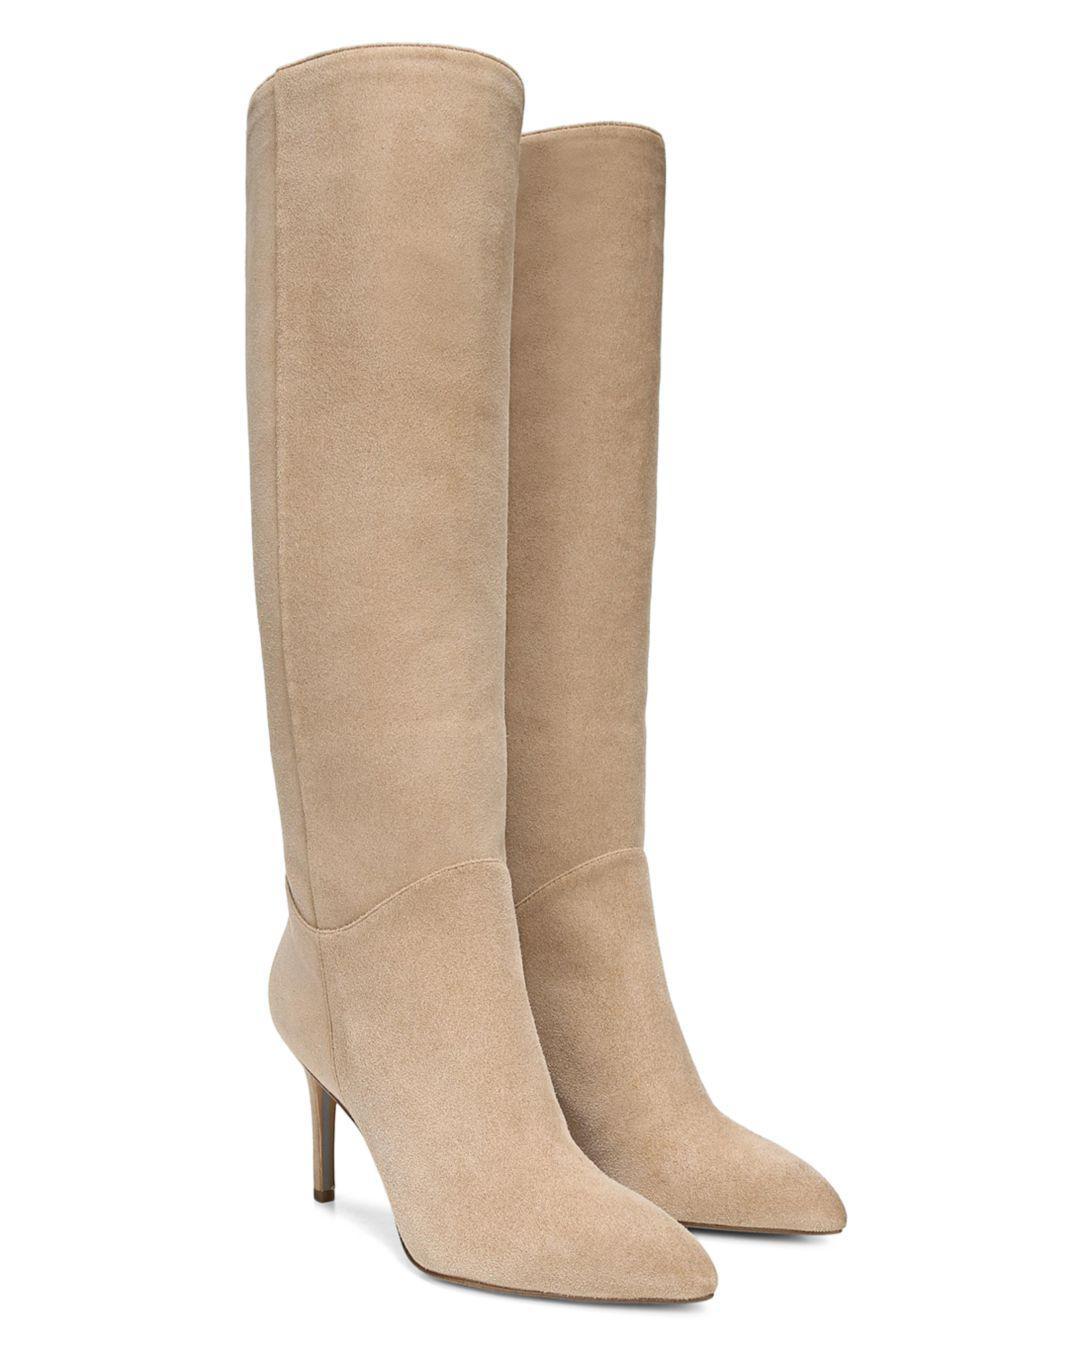 b68f7eb6eda Lyst - Sam Edelman Women s Olen Pointed Toe Suede High-heel Boots in ...